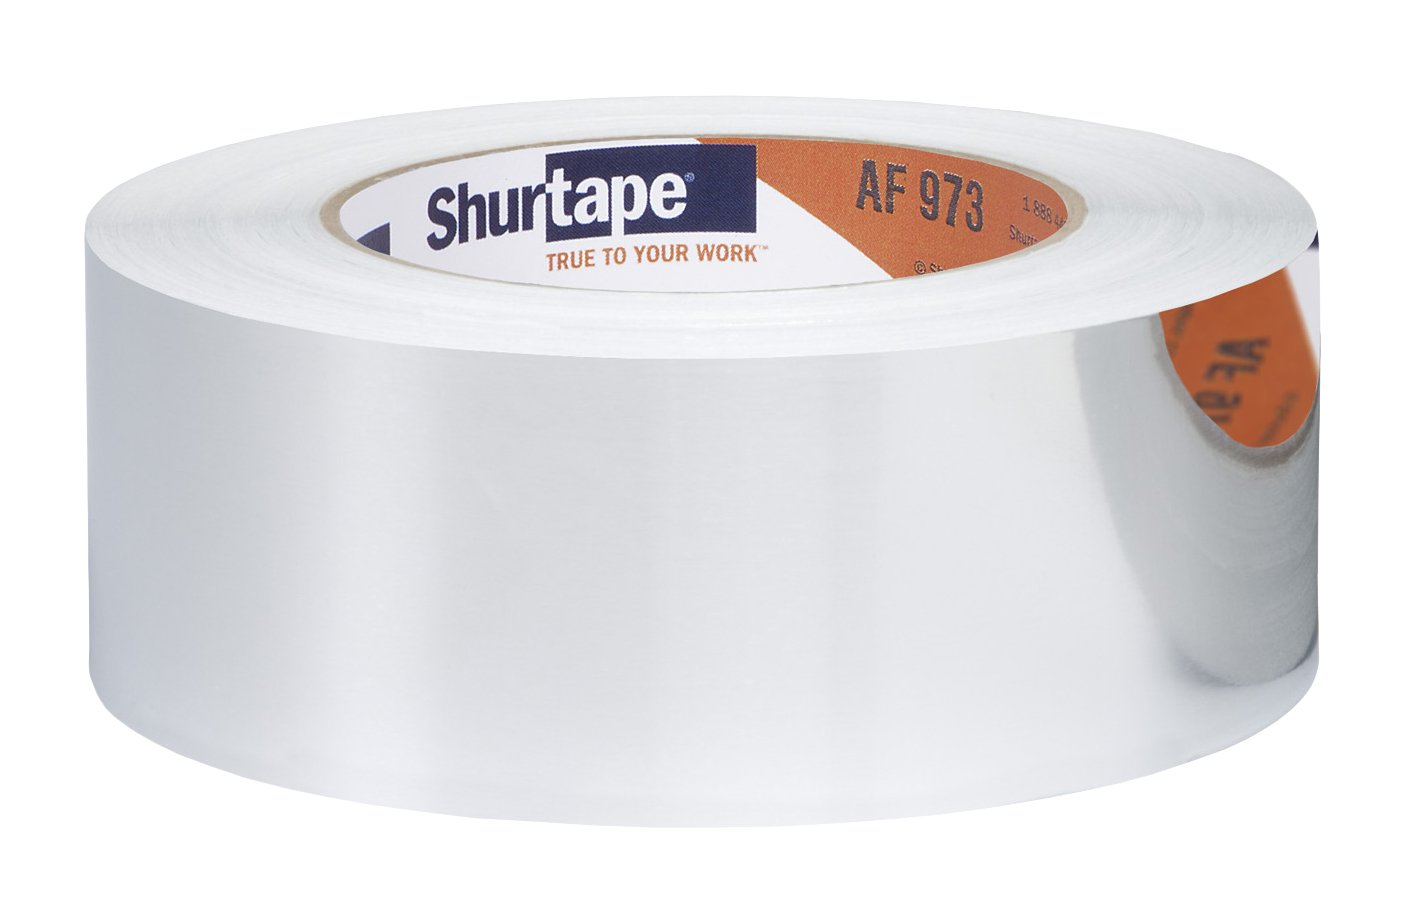 Shurtape AF 973 Aluminum HVAC Contractor Grade Foil Tape, 46m Length x 48mm Width, Silver